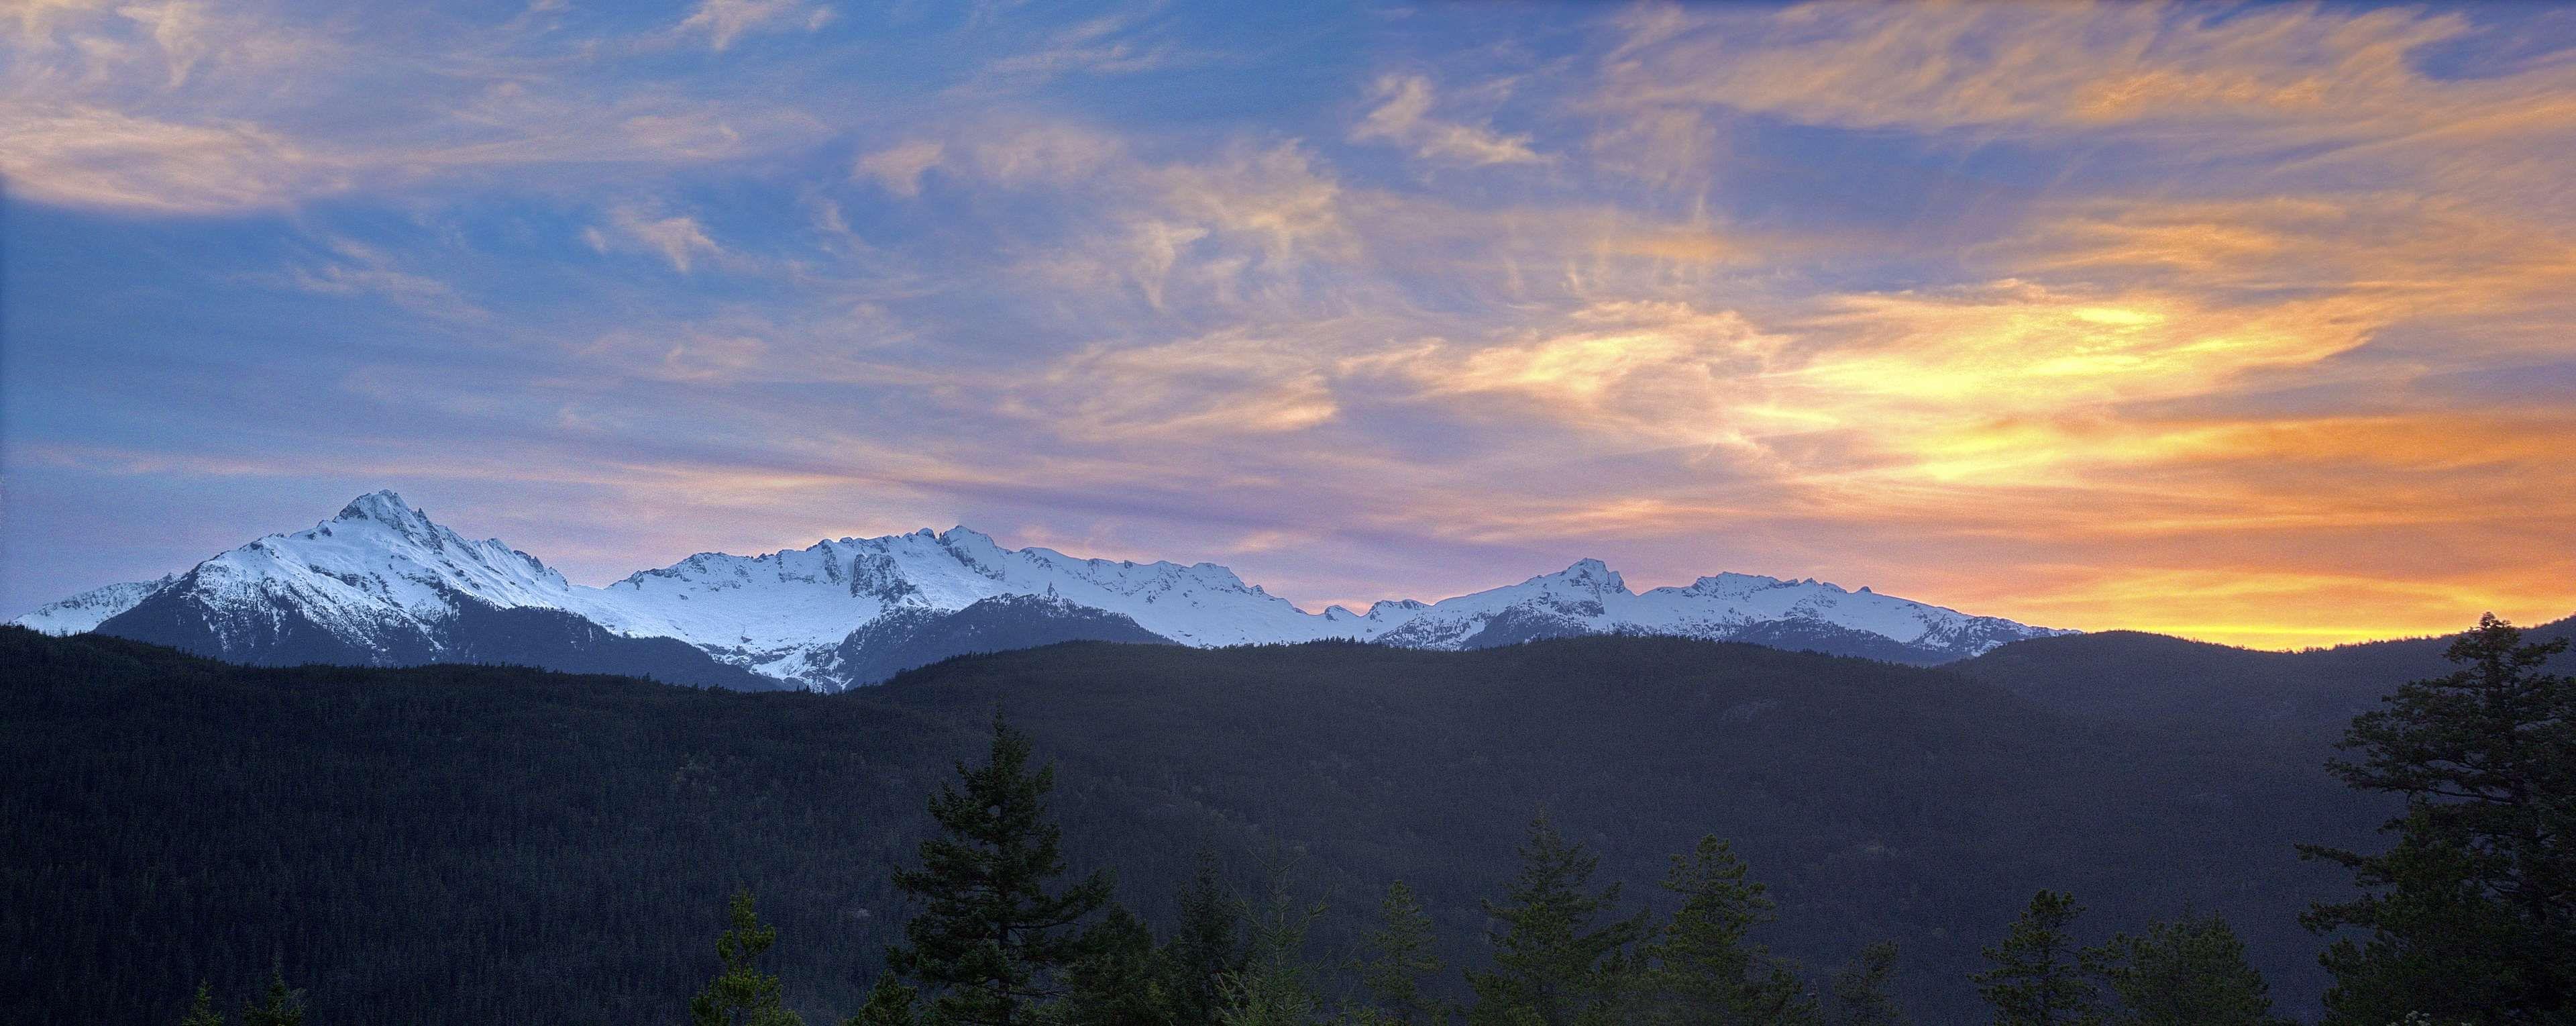 Dawn Dusk Landscape Mountain Range Mountains Nature Outdoors Panoramic Sky Snow Sunrise Sunset Winter 4k Wallpaper